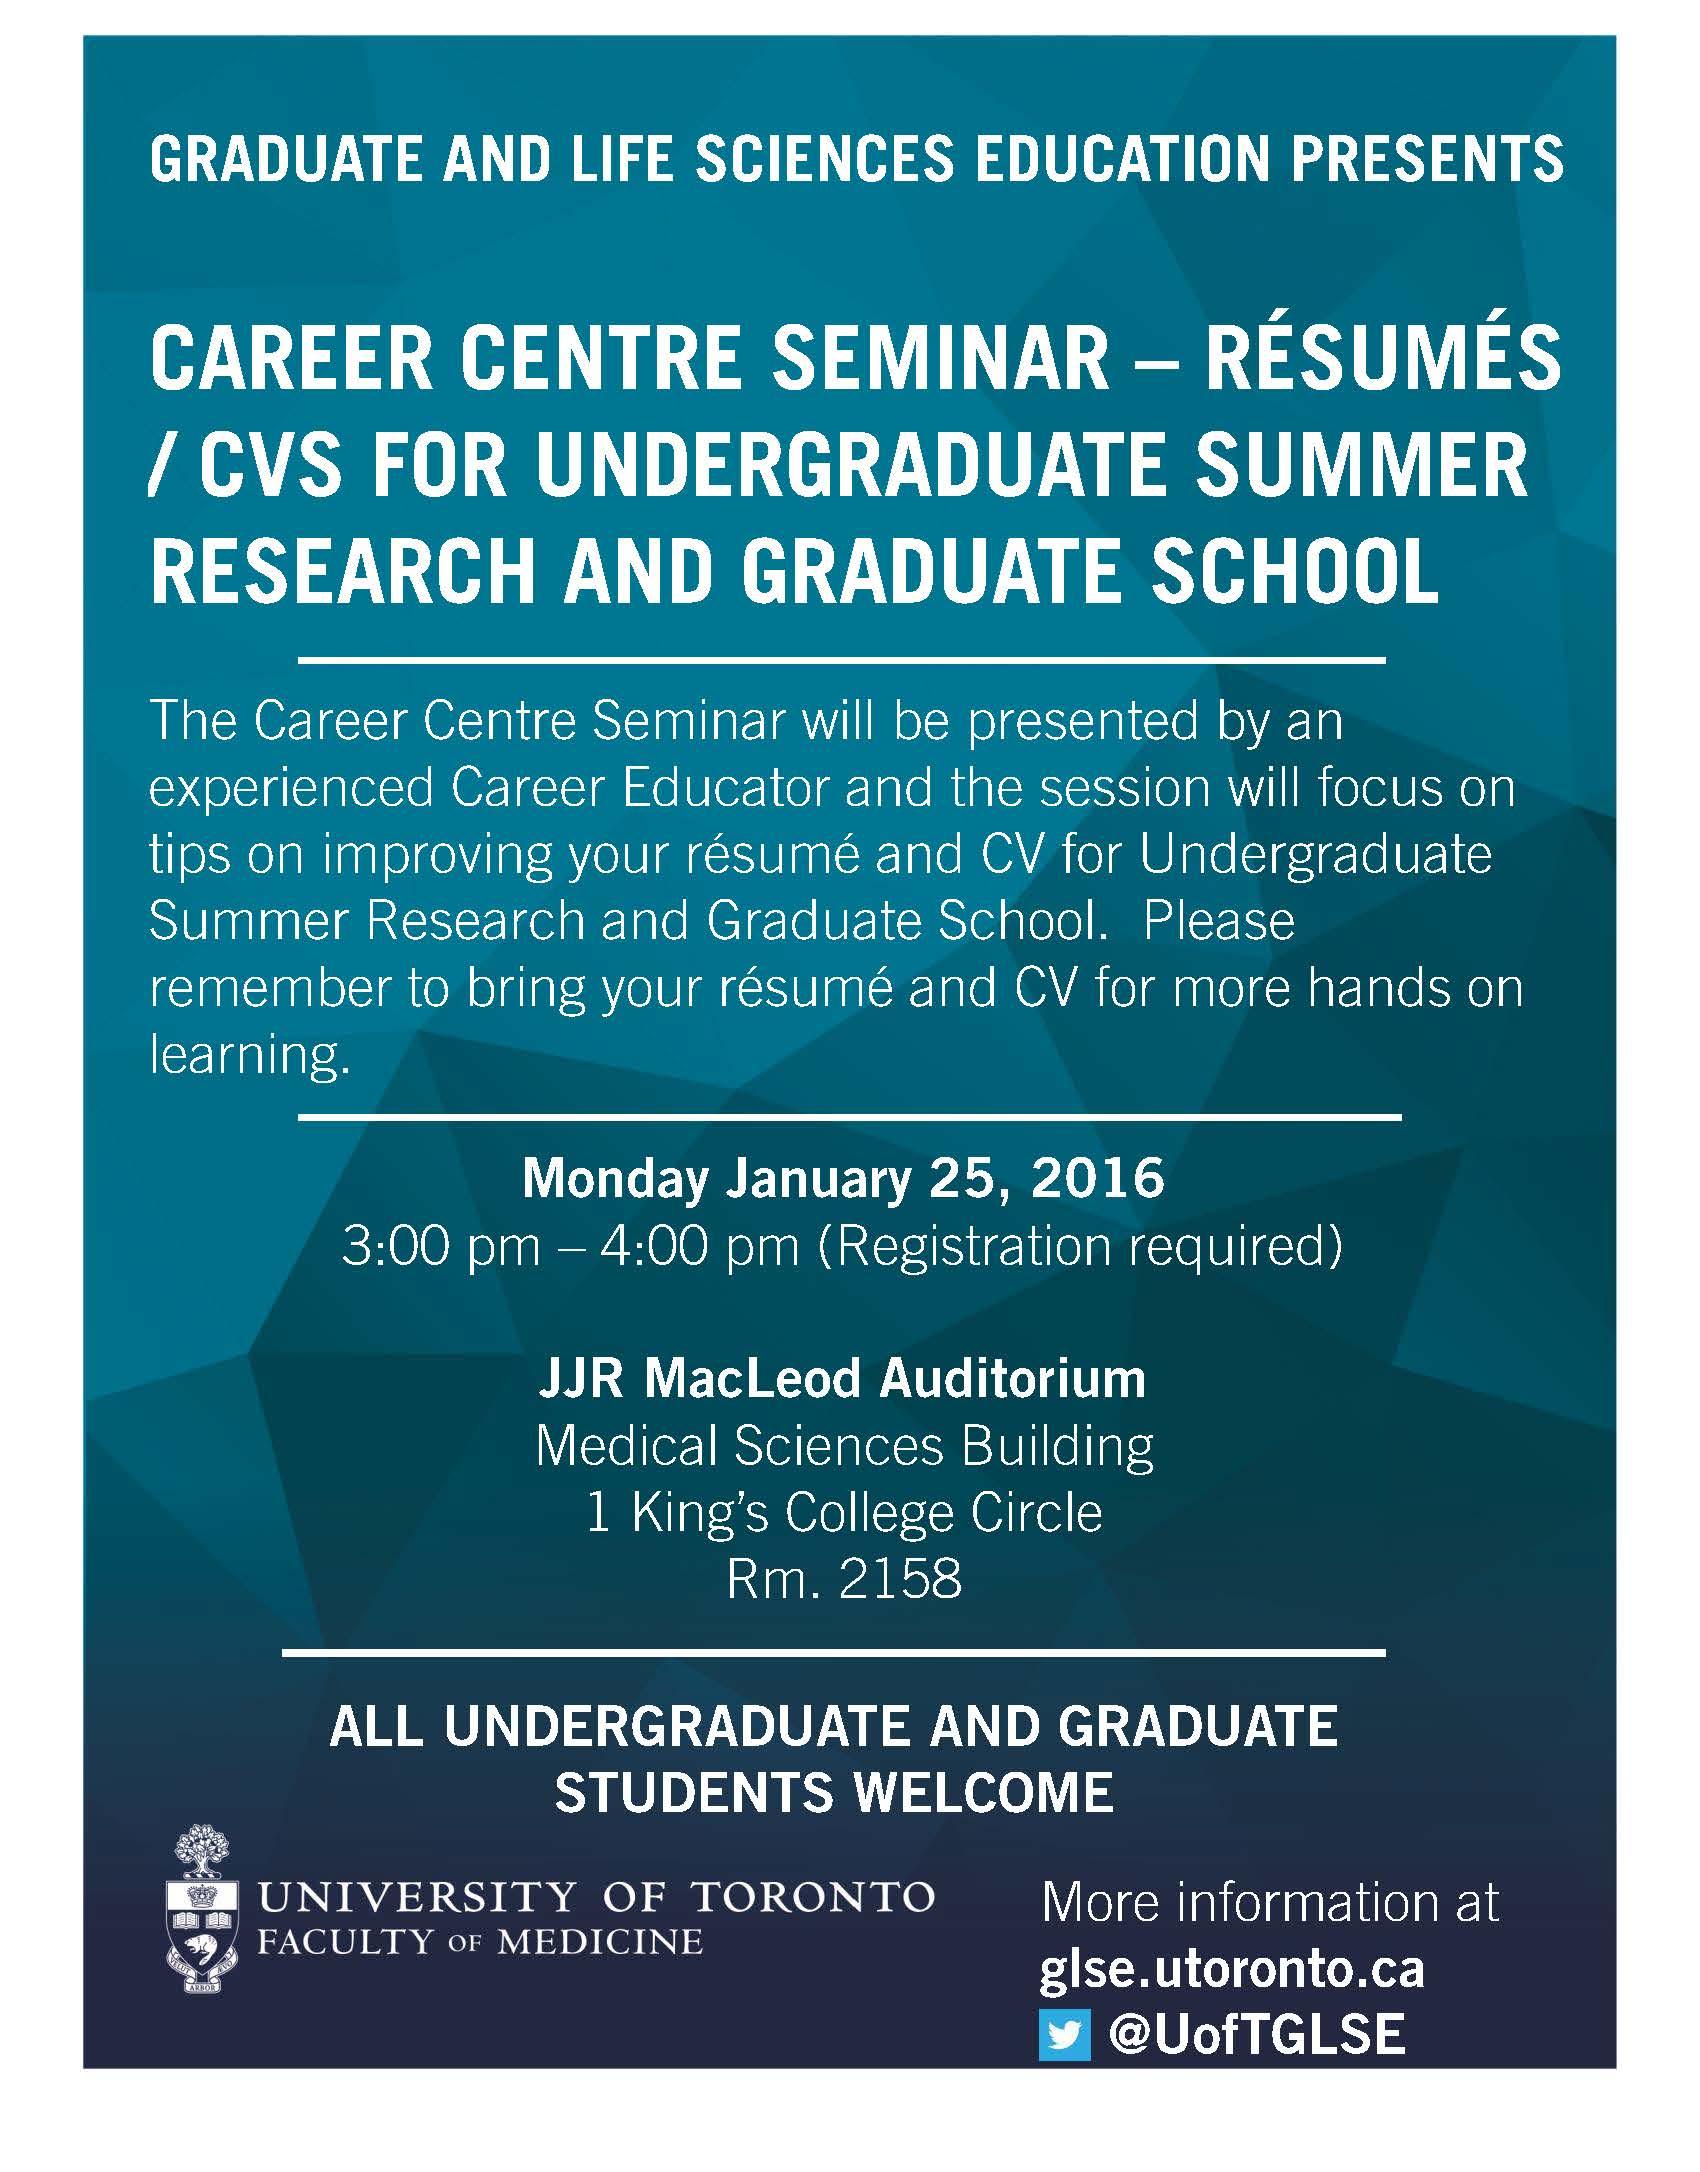 glse career centre seminar r eacute sum eacute and cv for undergraduate glse resume and cv career seminar